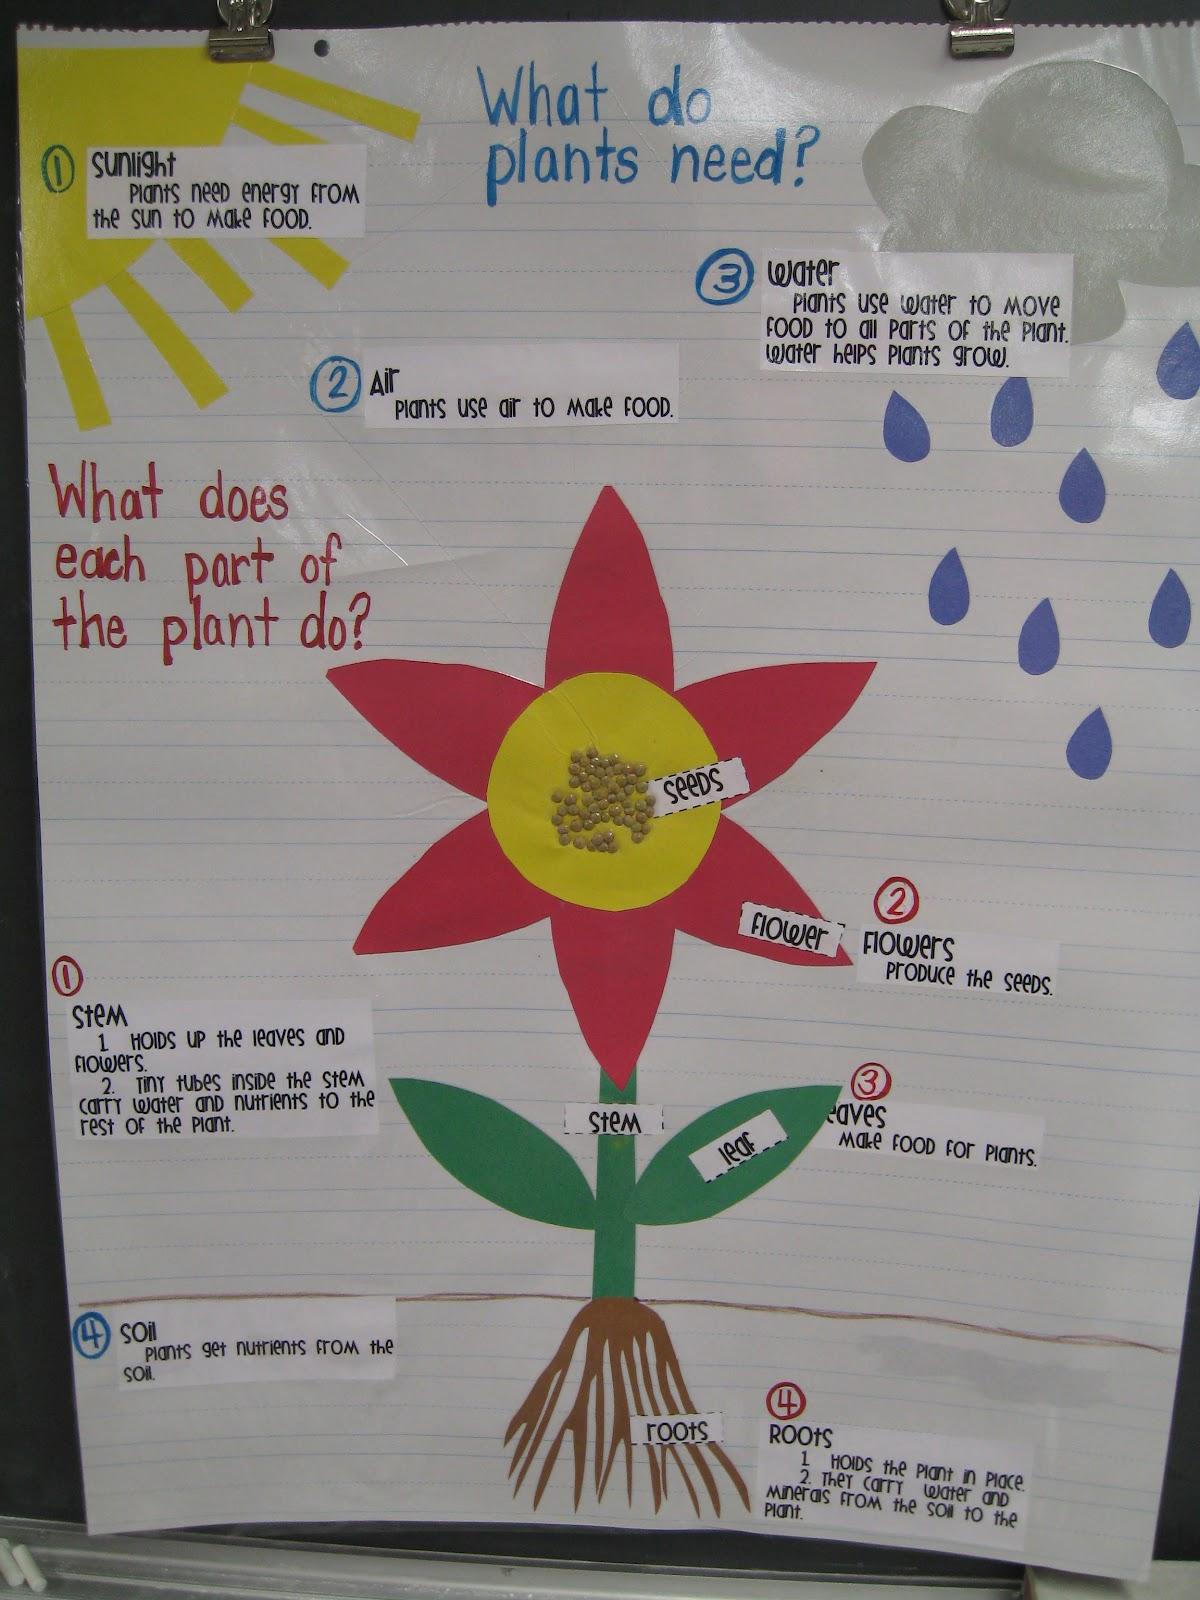 plant parts we eat worksheet plants pinterest plant parts plants and 1st grades. Black Bedroom Furniture Sets. Home Design Ideas